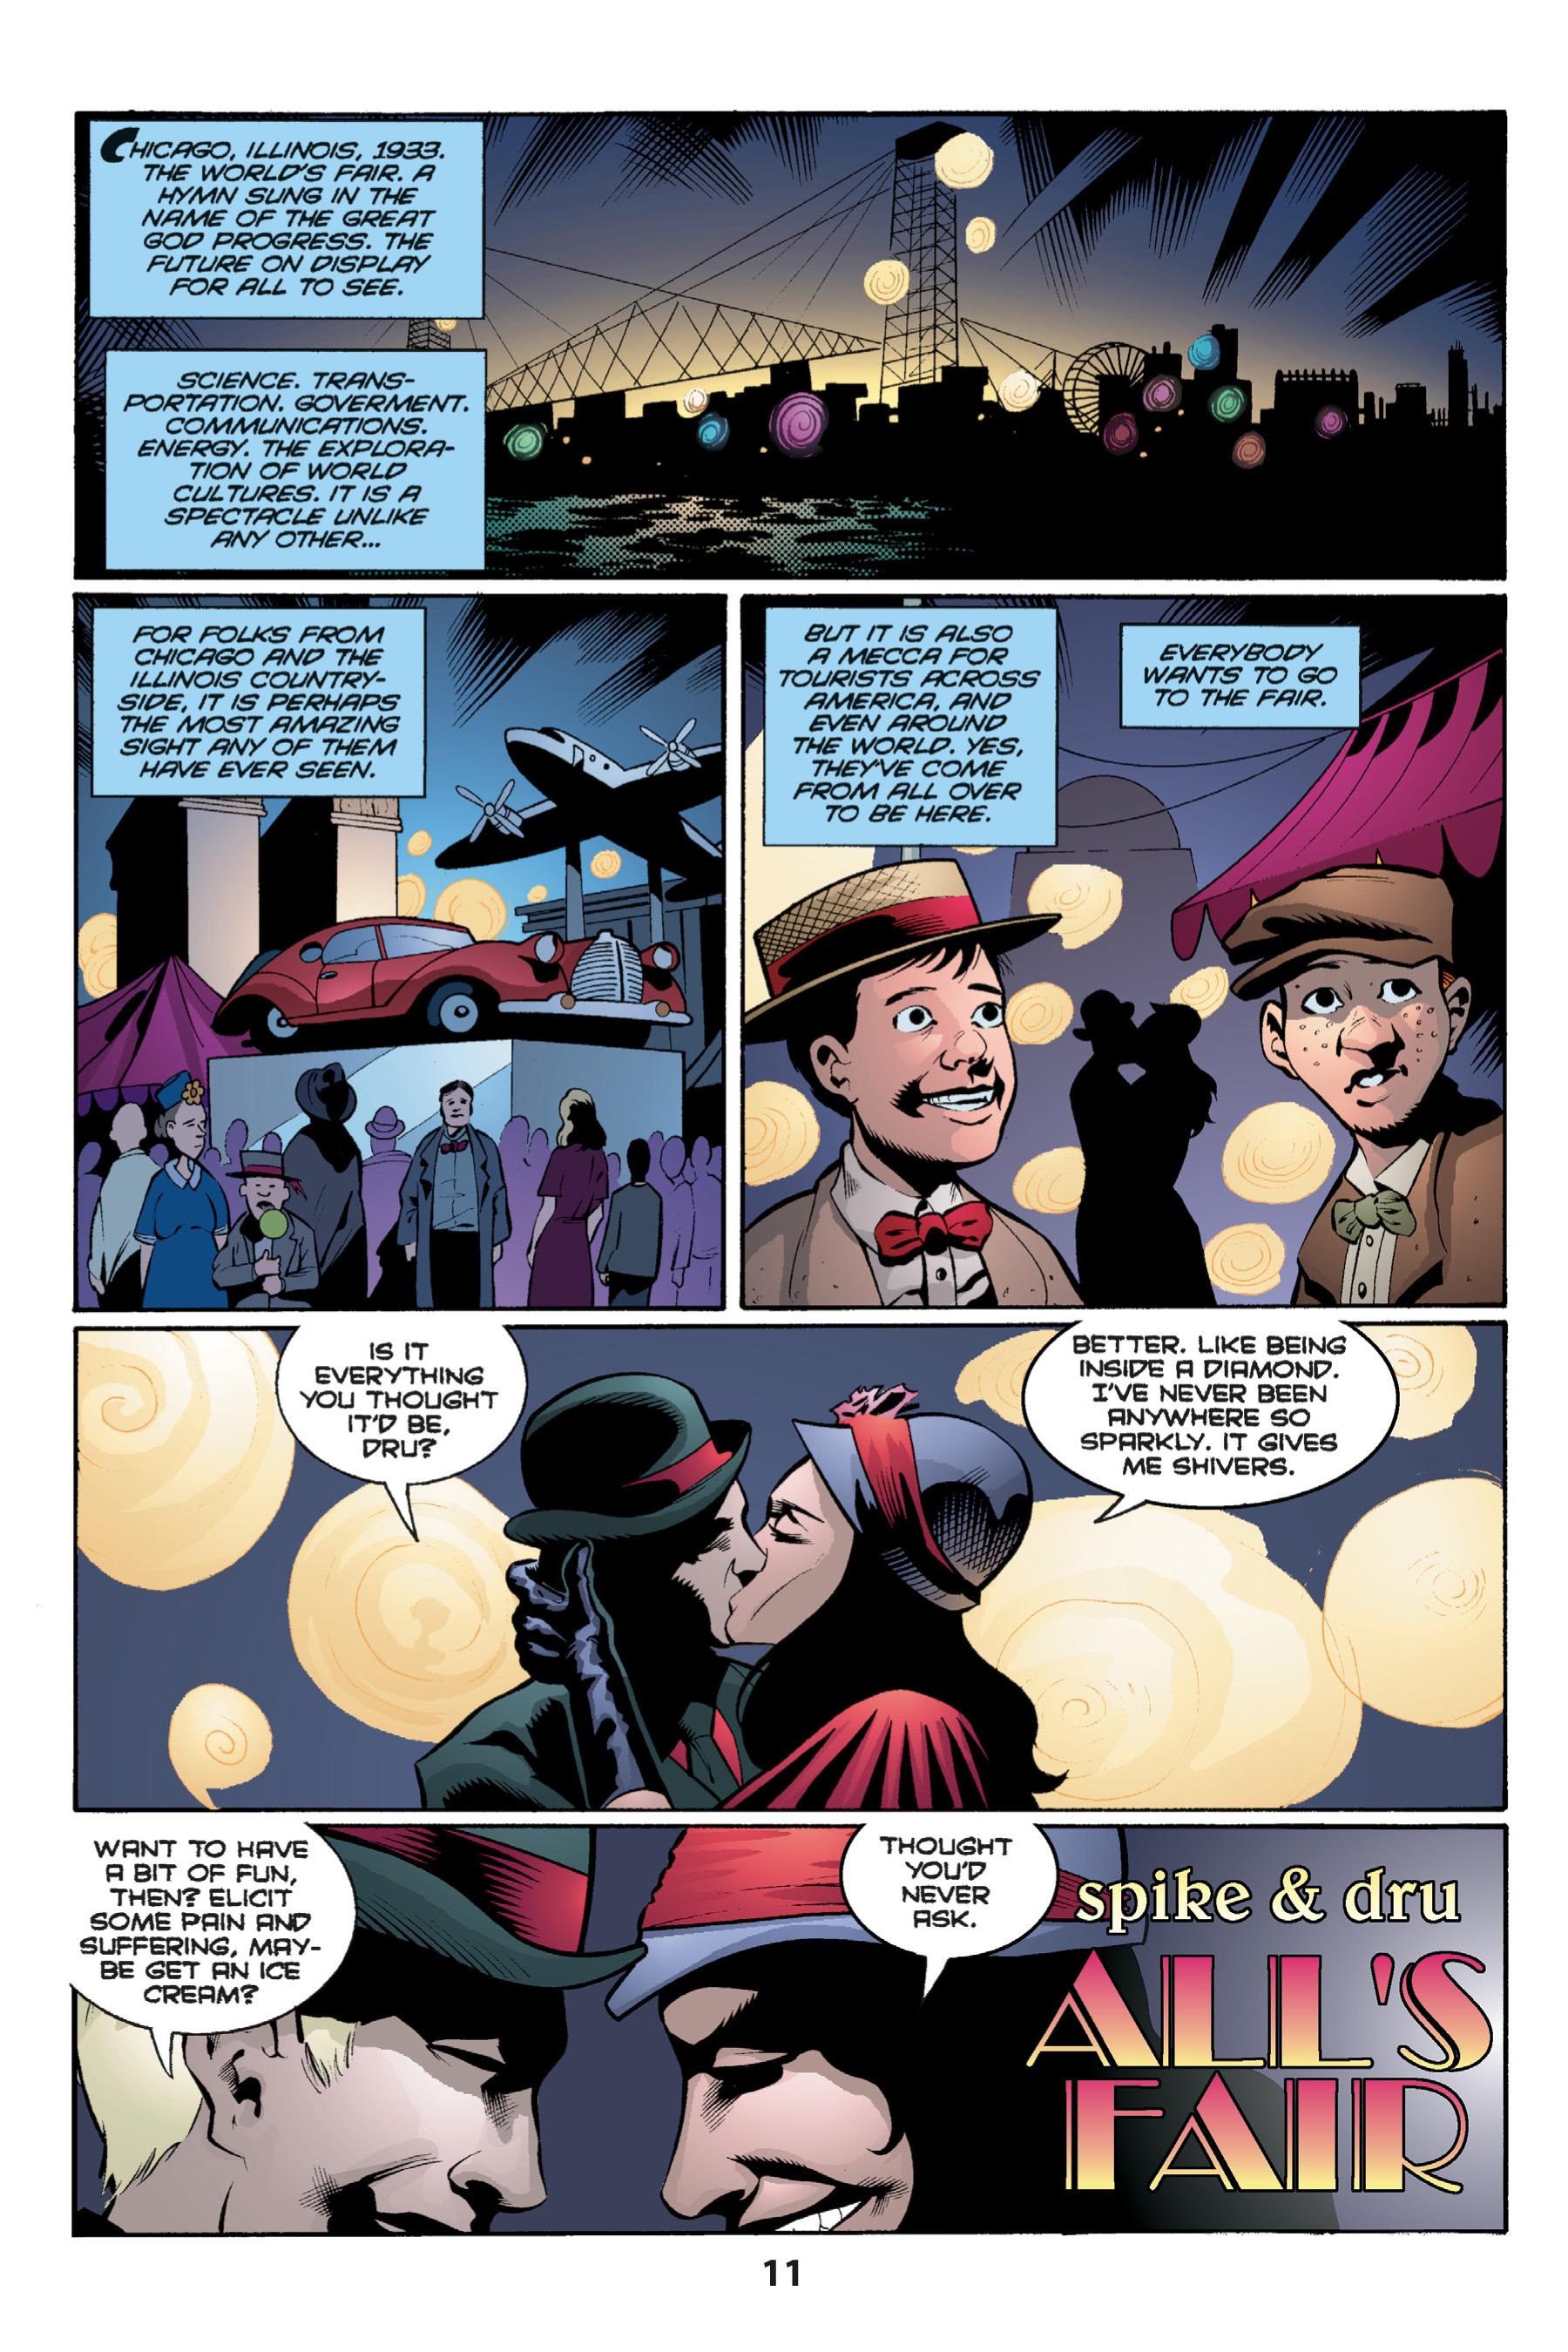 Read online Buffy the Vampire Slayer: Omnibus comic -  Issue # TPB 1 - 13